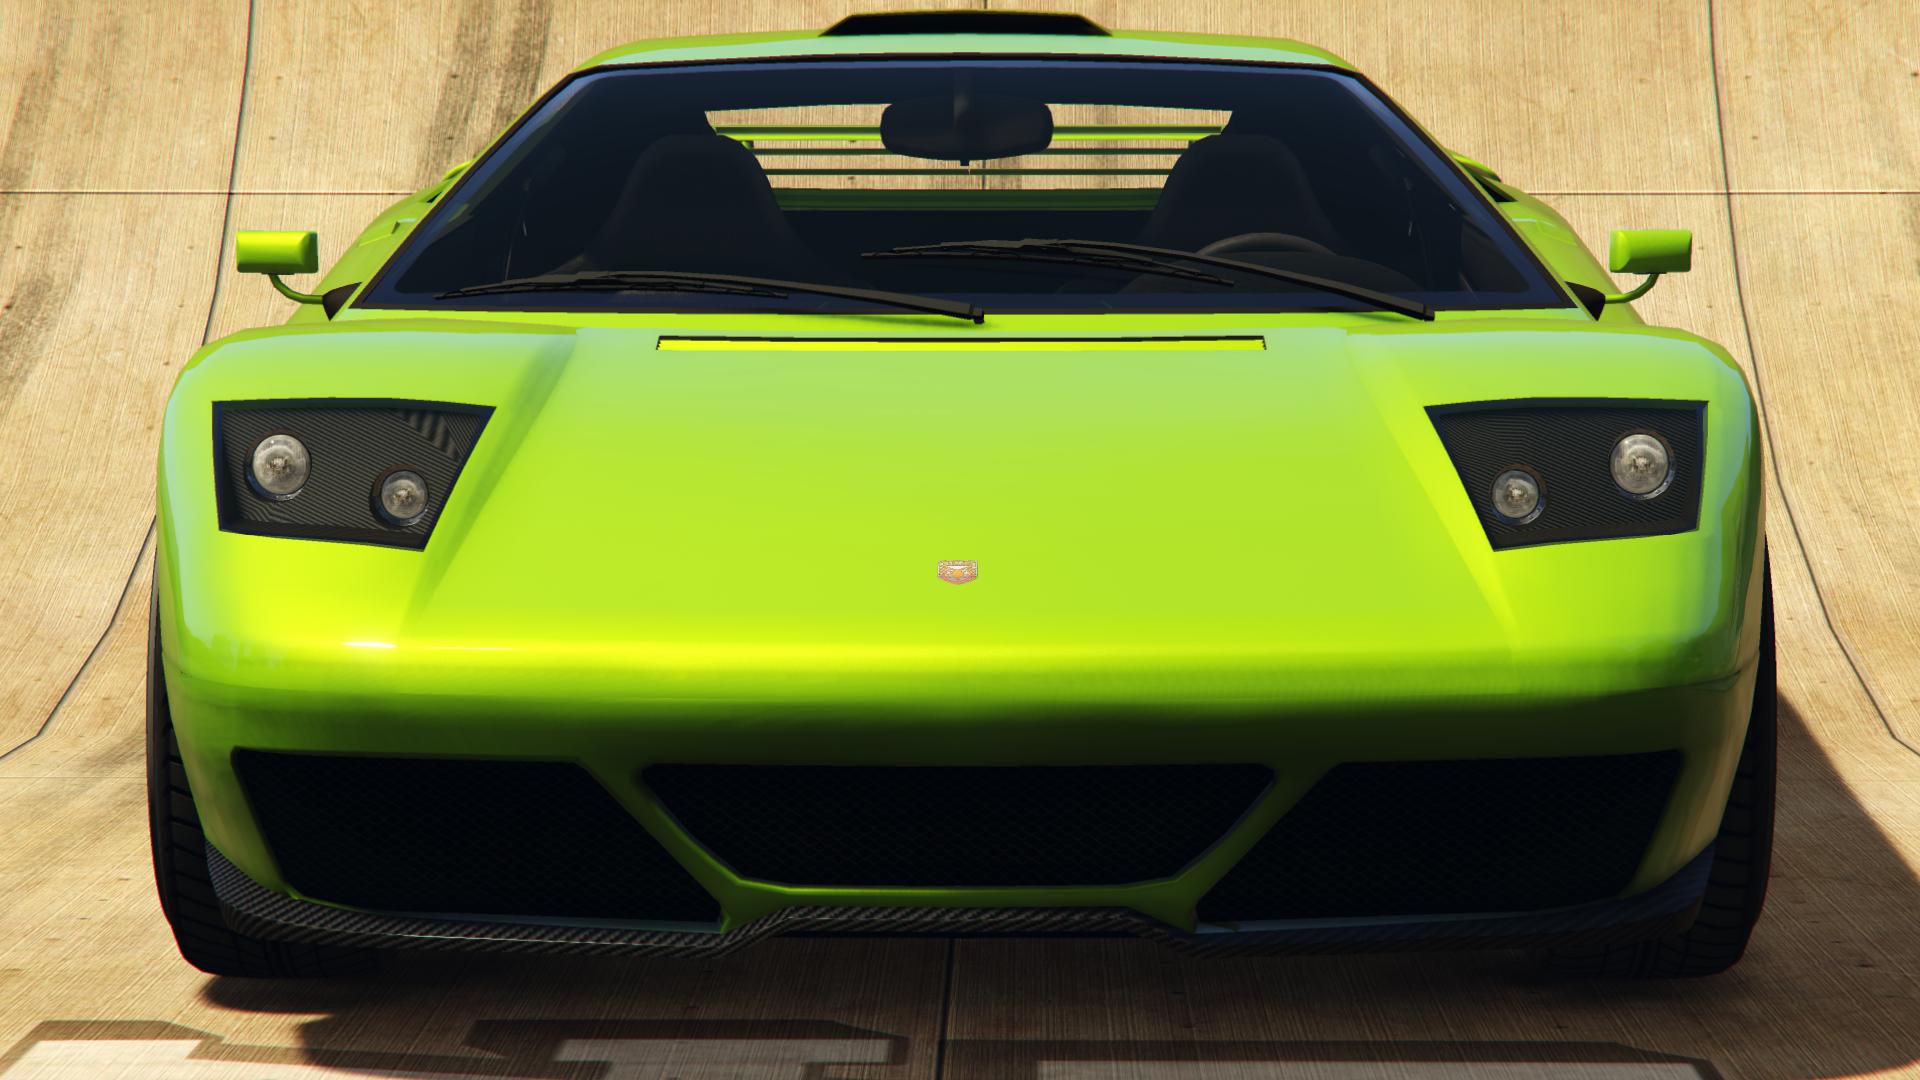 Infernus GTA 5